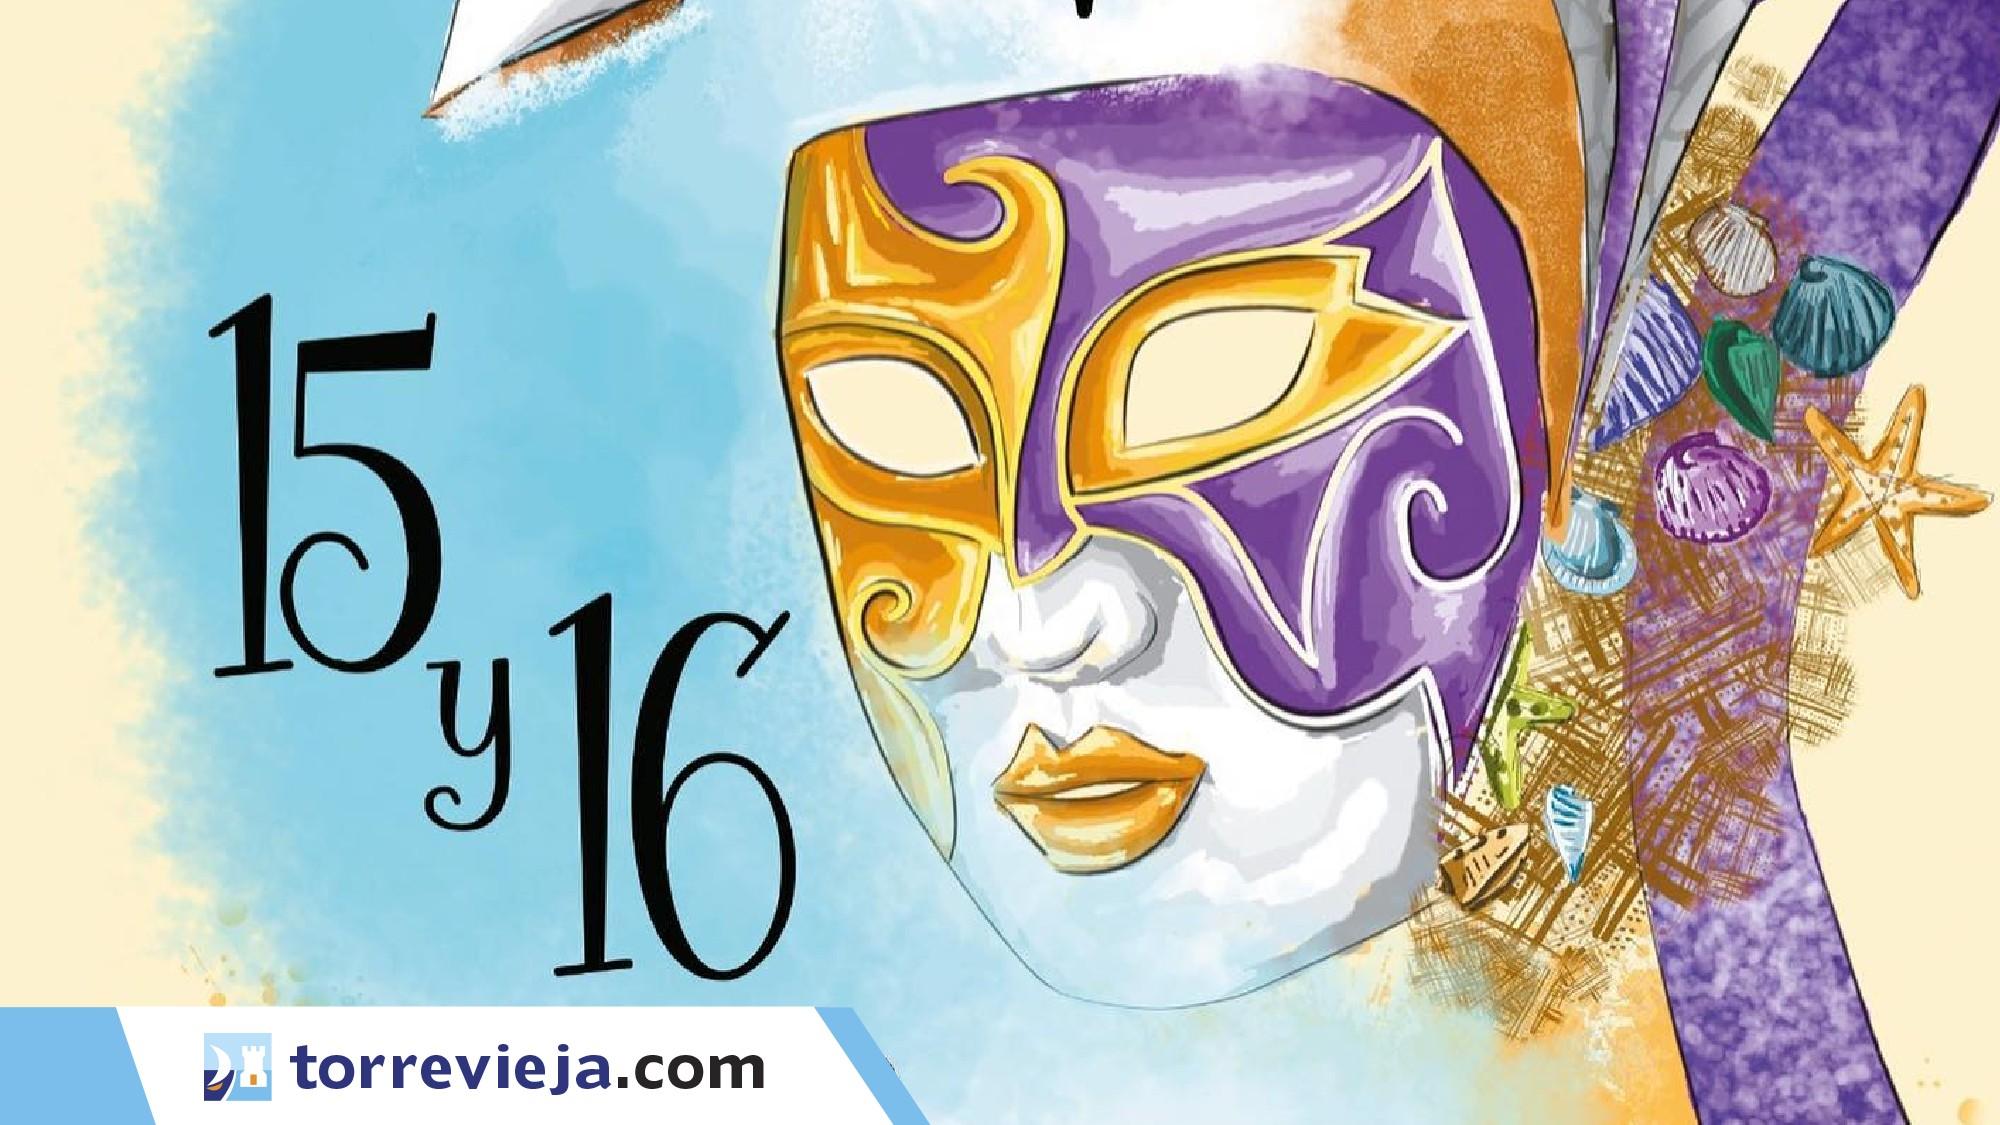 carnaval d'été Torrevieja 2021